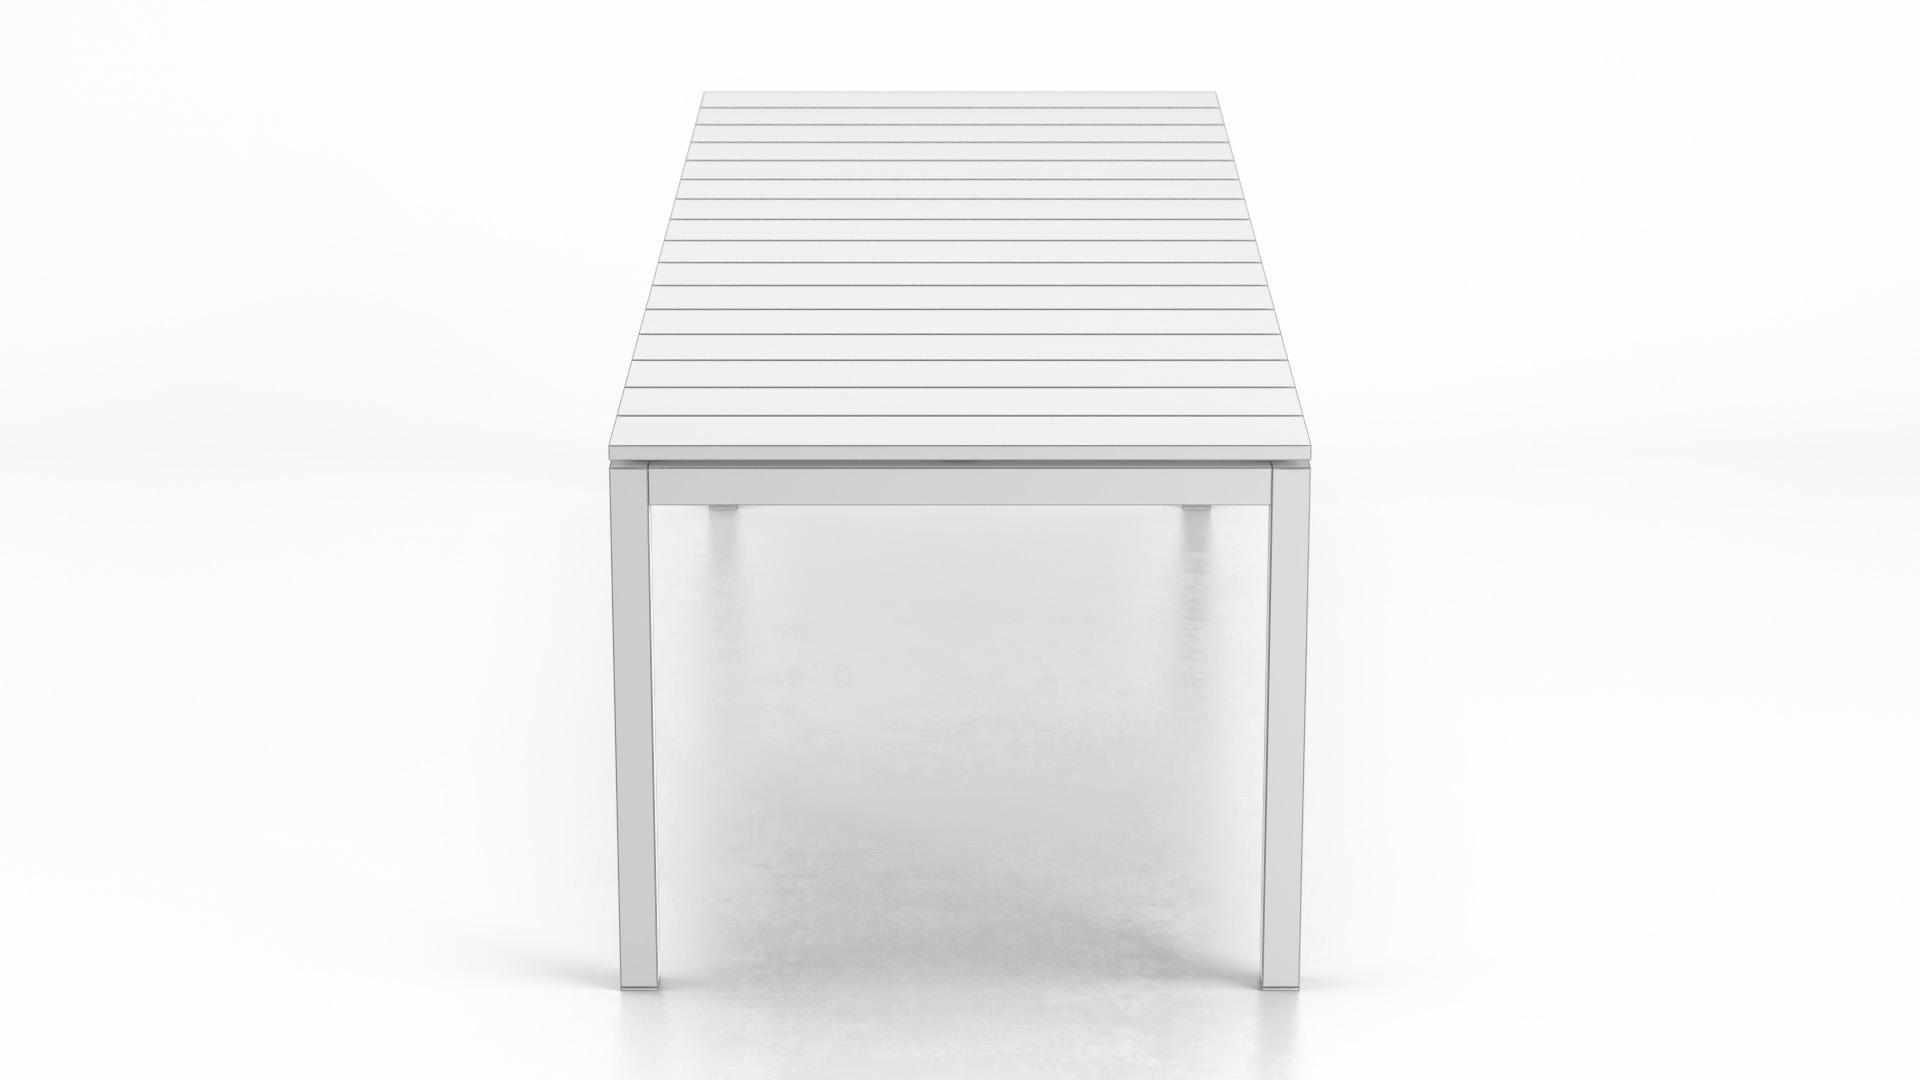 Tribu_NatalTechno_Table_WhiteSet_01_wire_0005